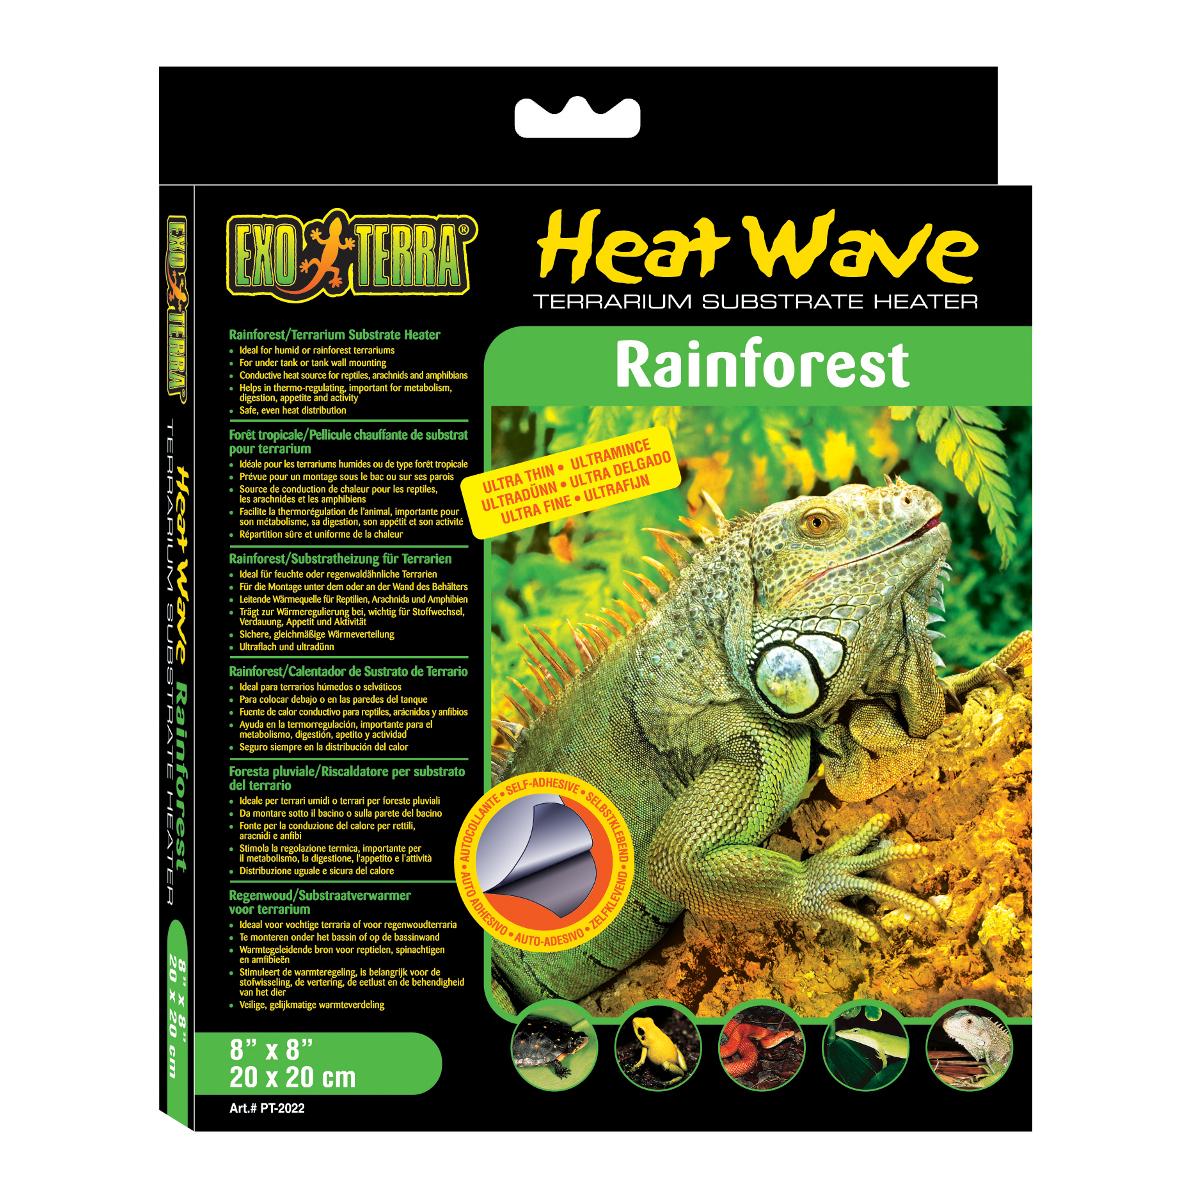 Deska topná EXO TERRA Heat Wave Rainforest